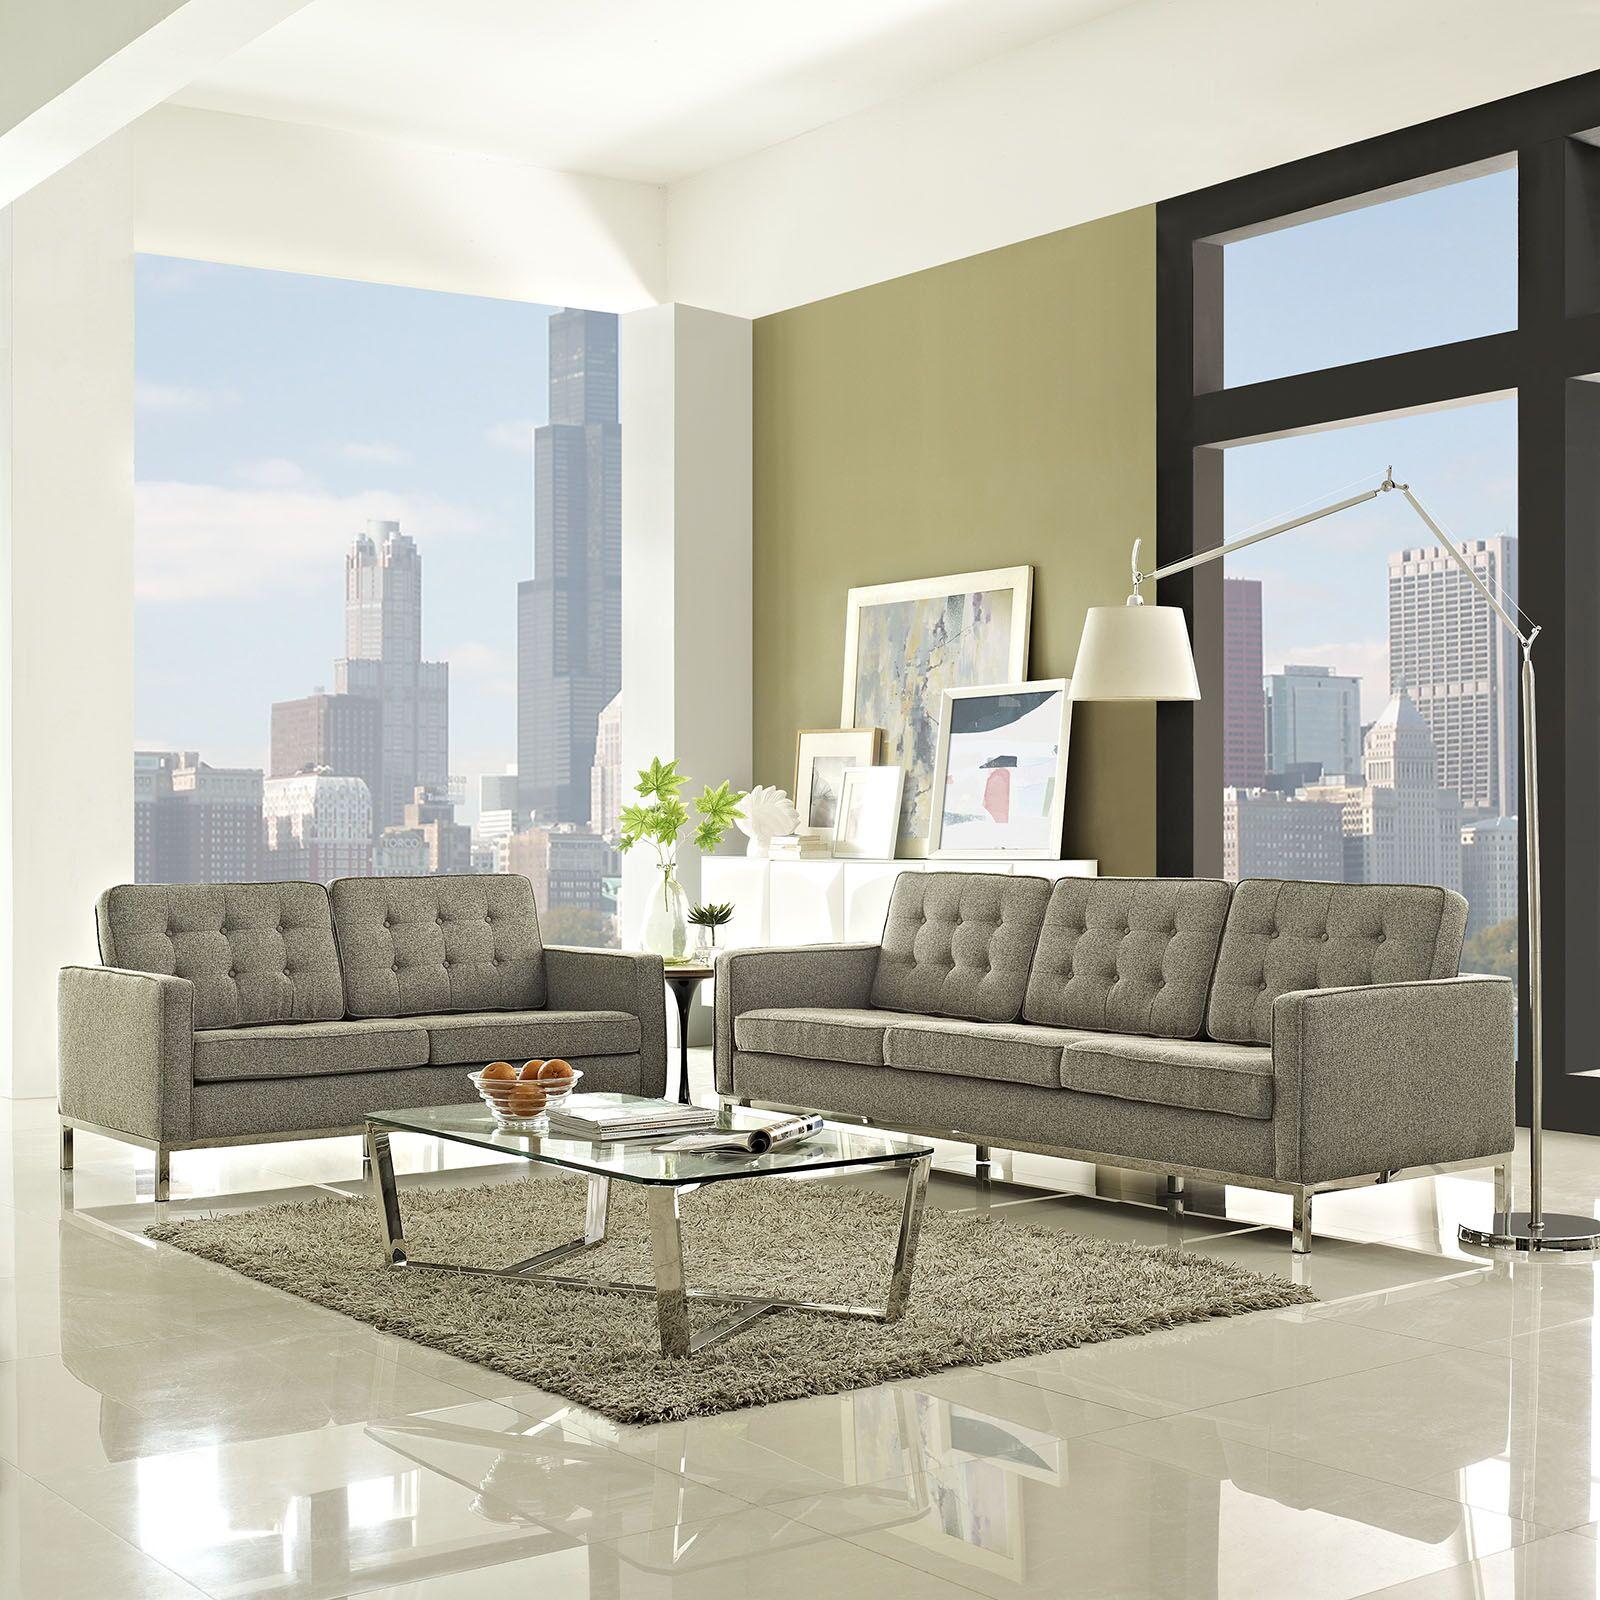 Gayatri 2 Piece Living Room Set Upholstery: Oatmeal